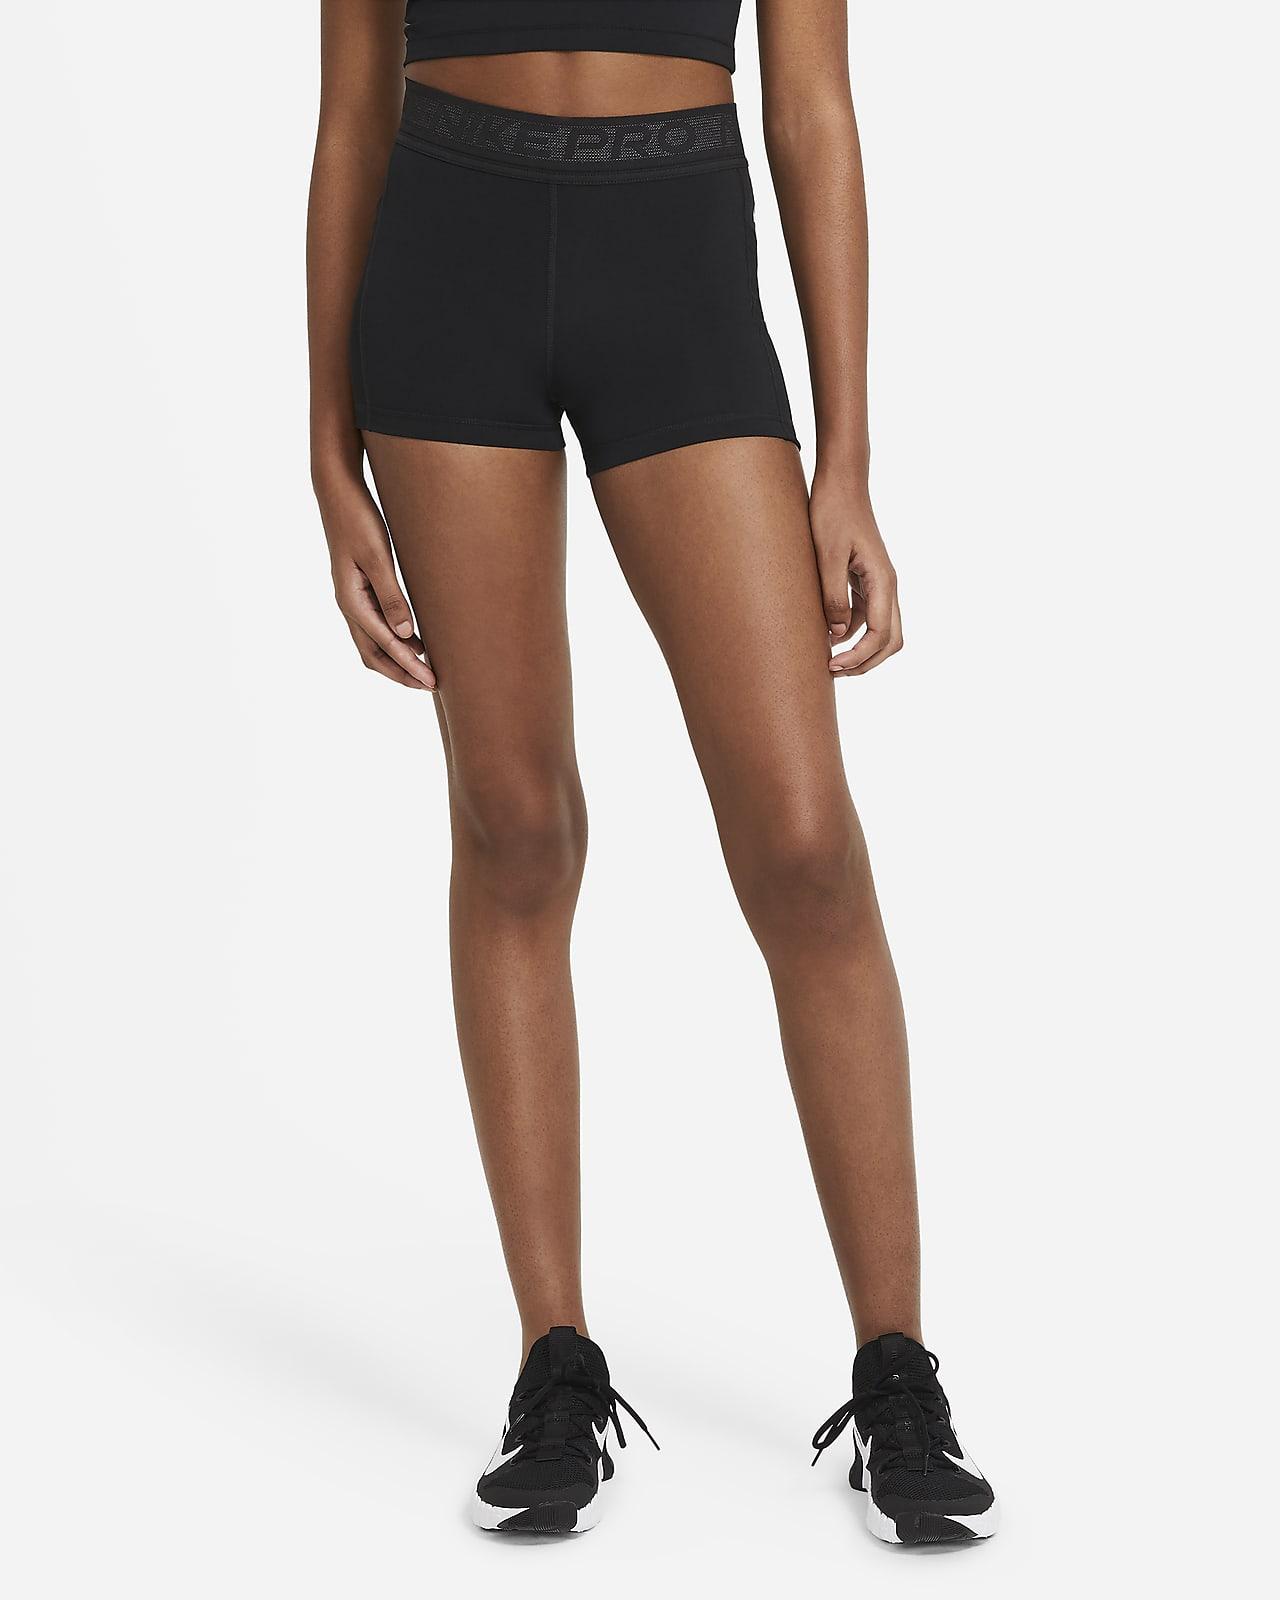 Shorts de 7.5 cm para mujer Nike Pro